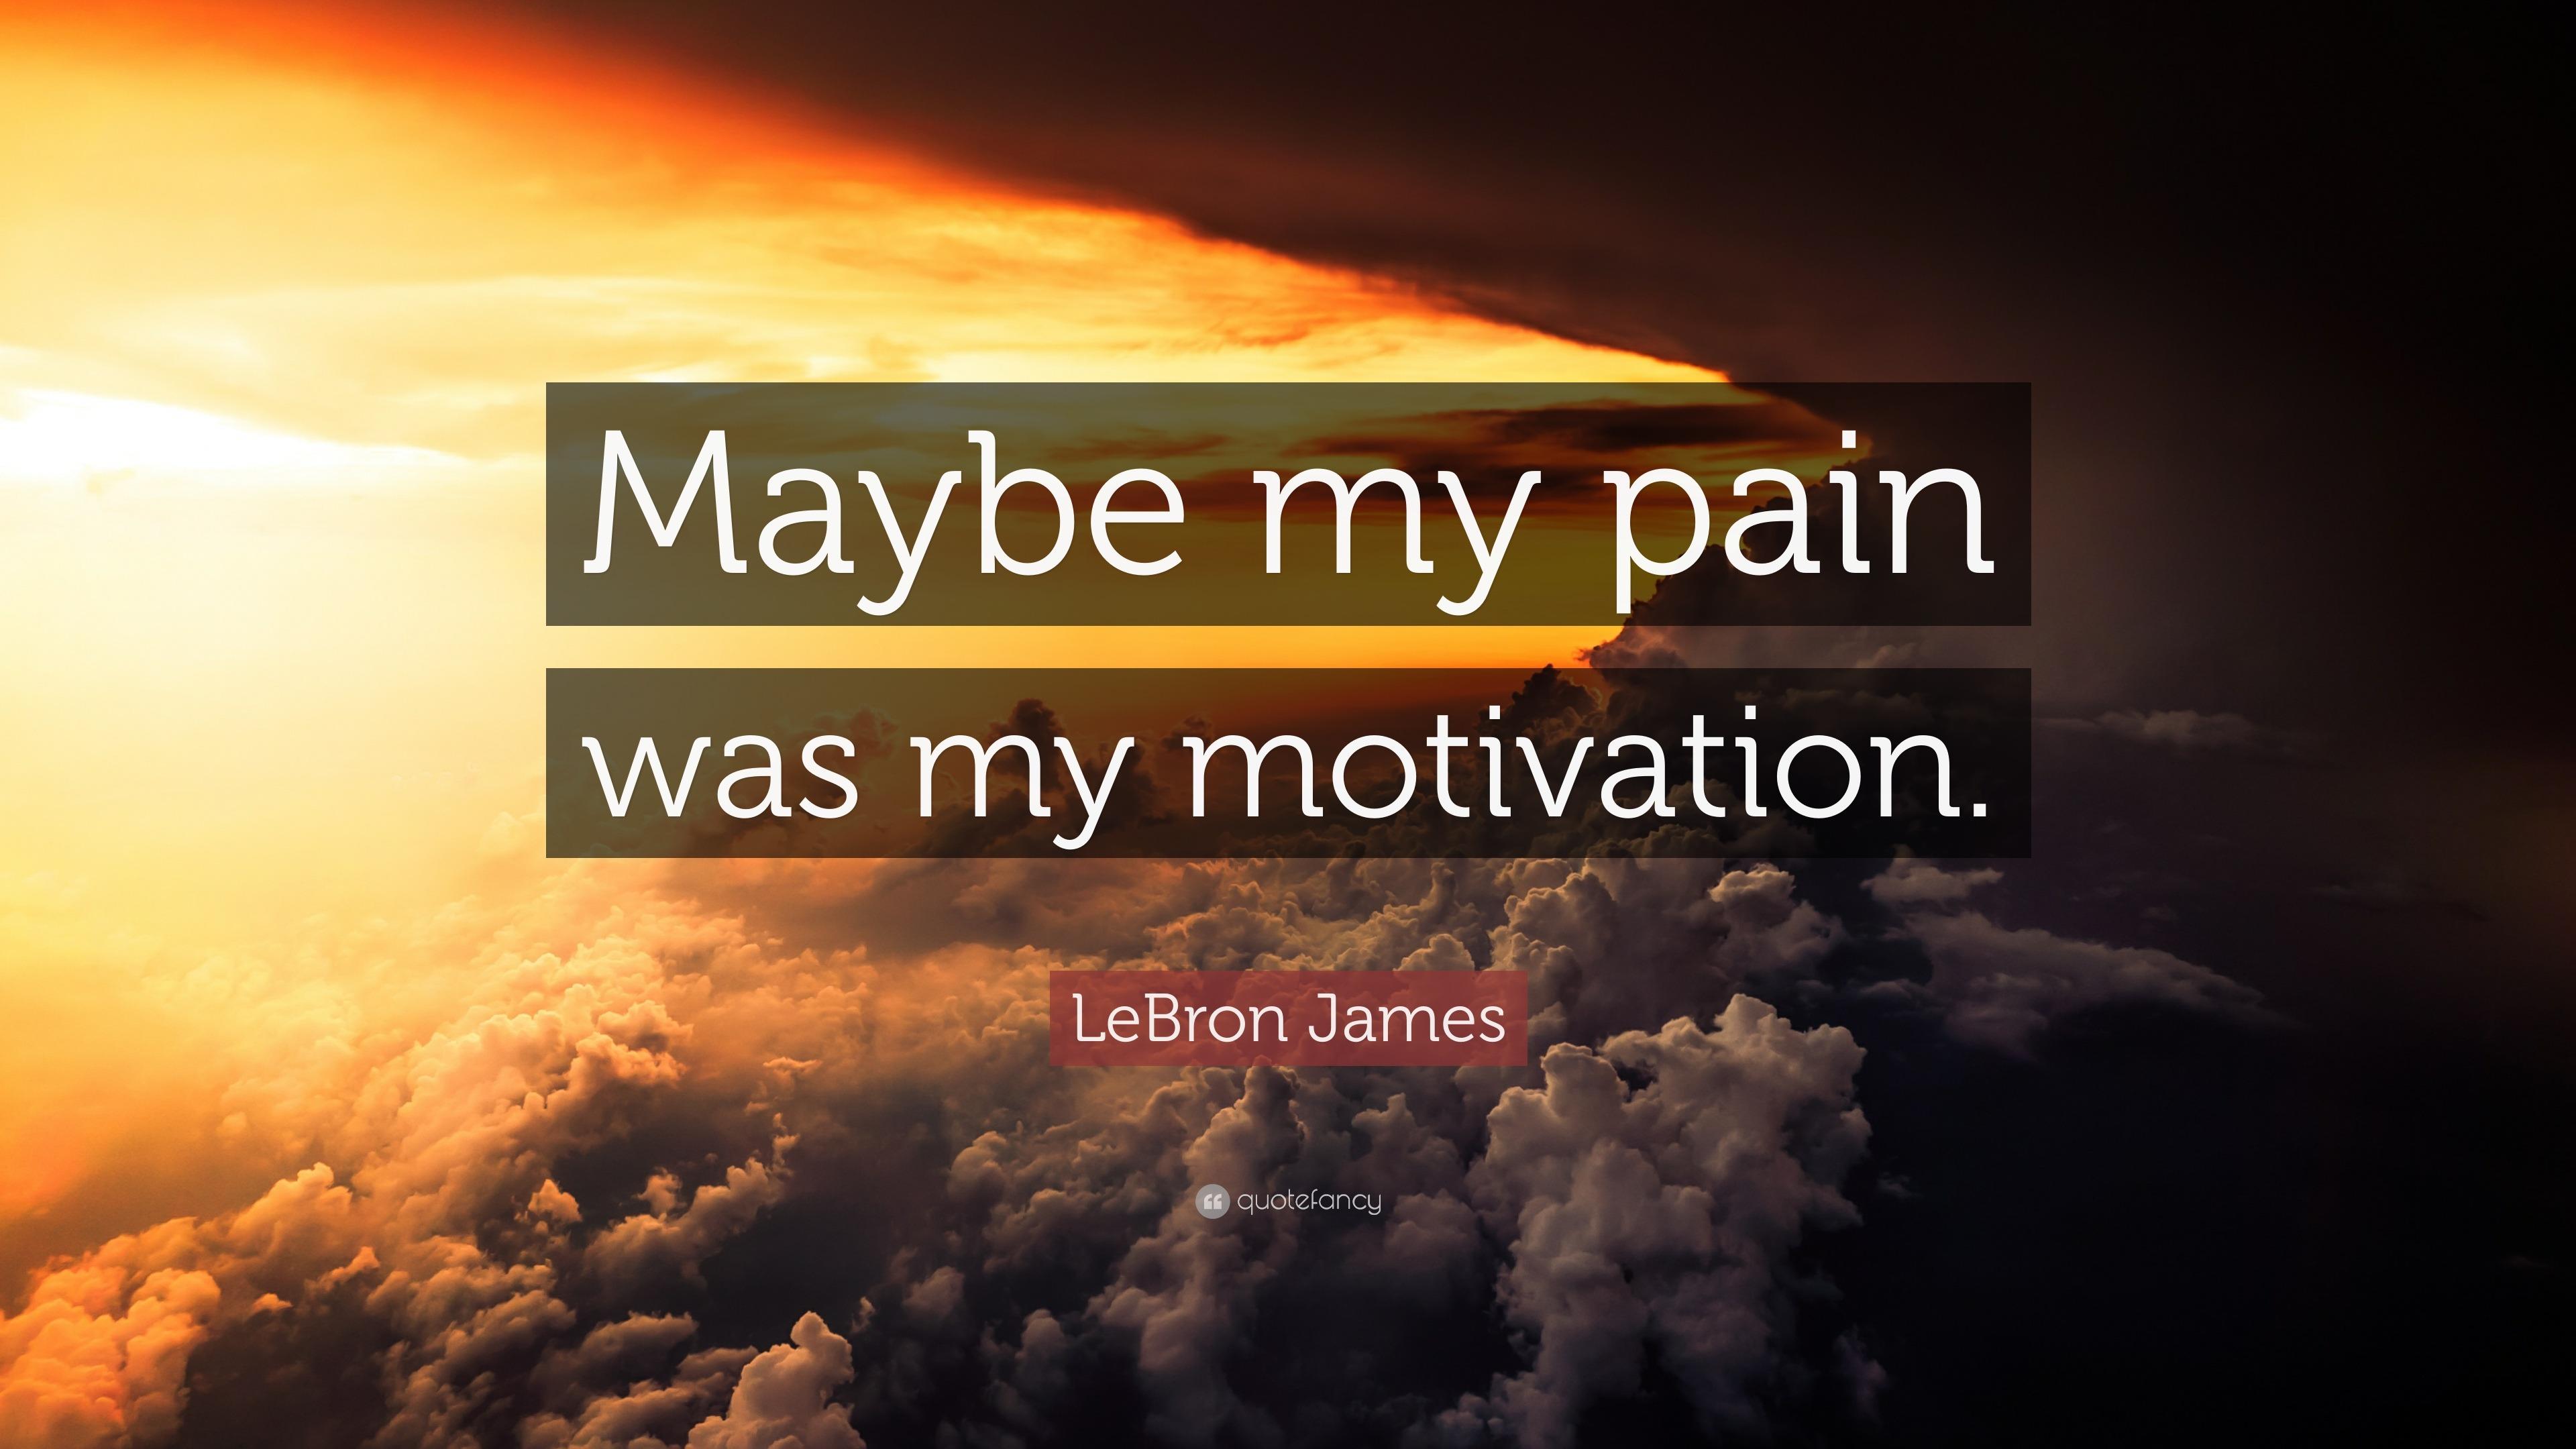 Lebron James Quotes 224 Wallpapers Quotefancy